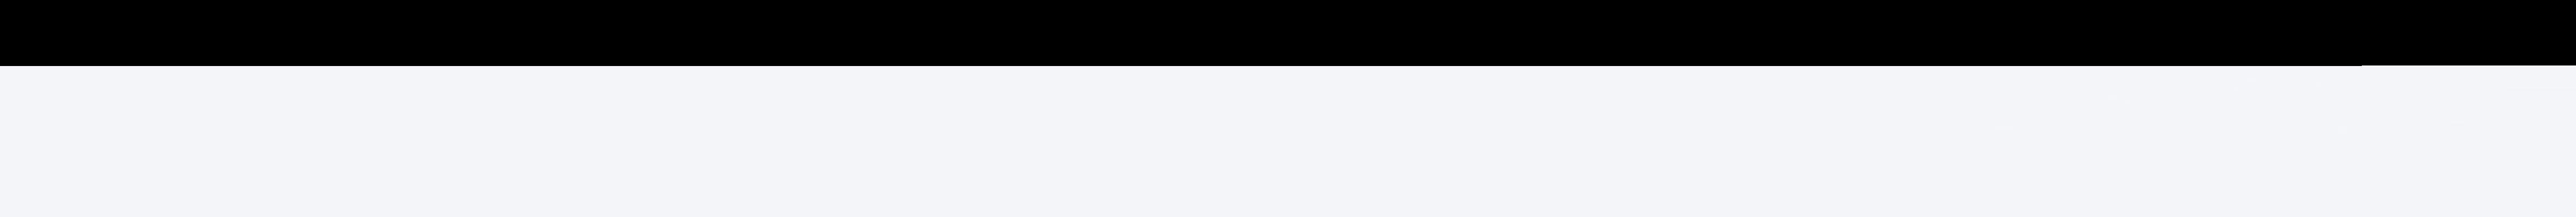 Marketing partnership logos